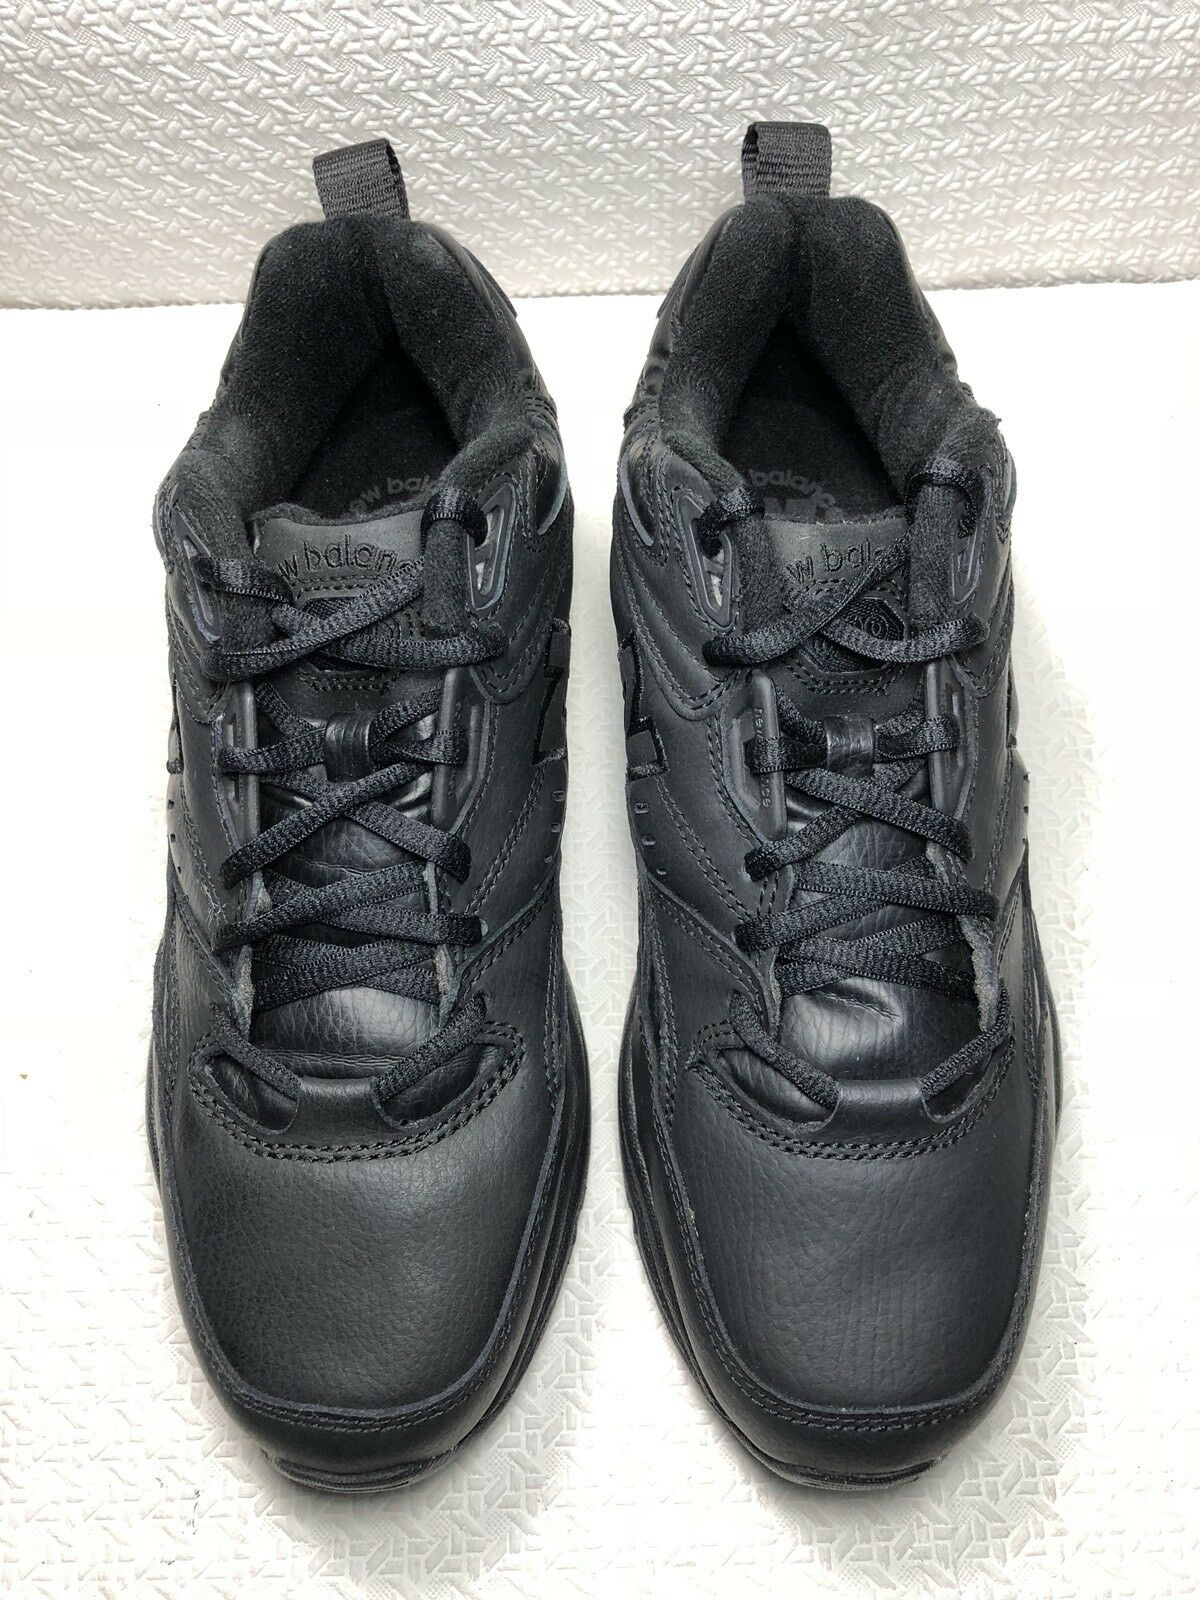 New Balance 609 MX1005NV Men's Running Sneakers Size-8.5 4E